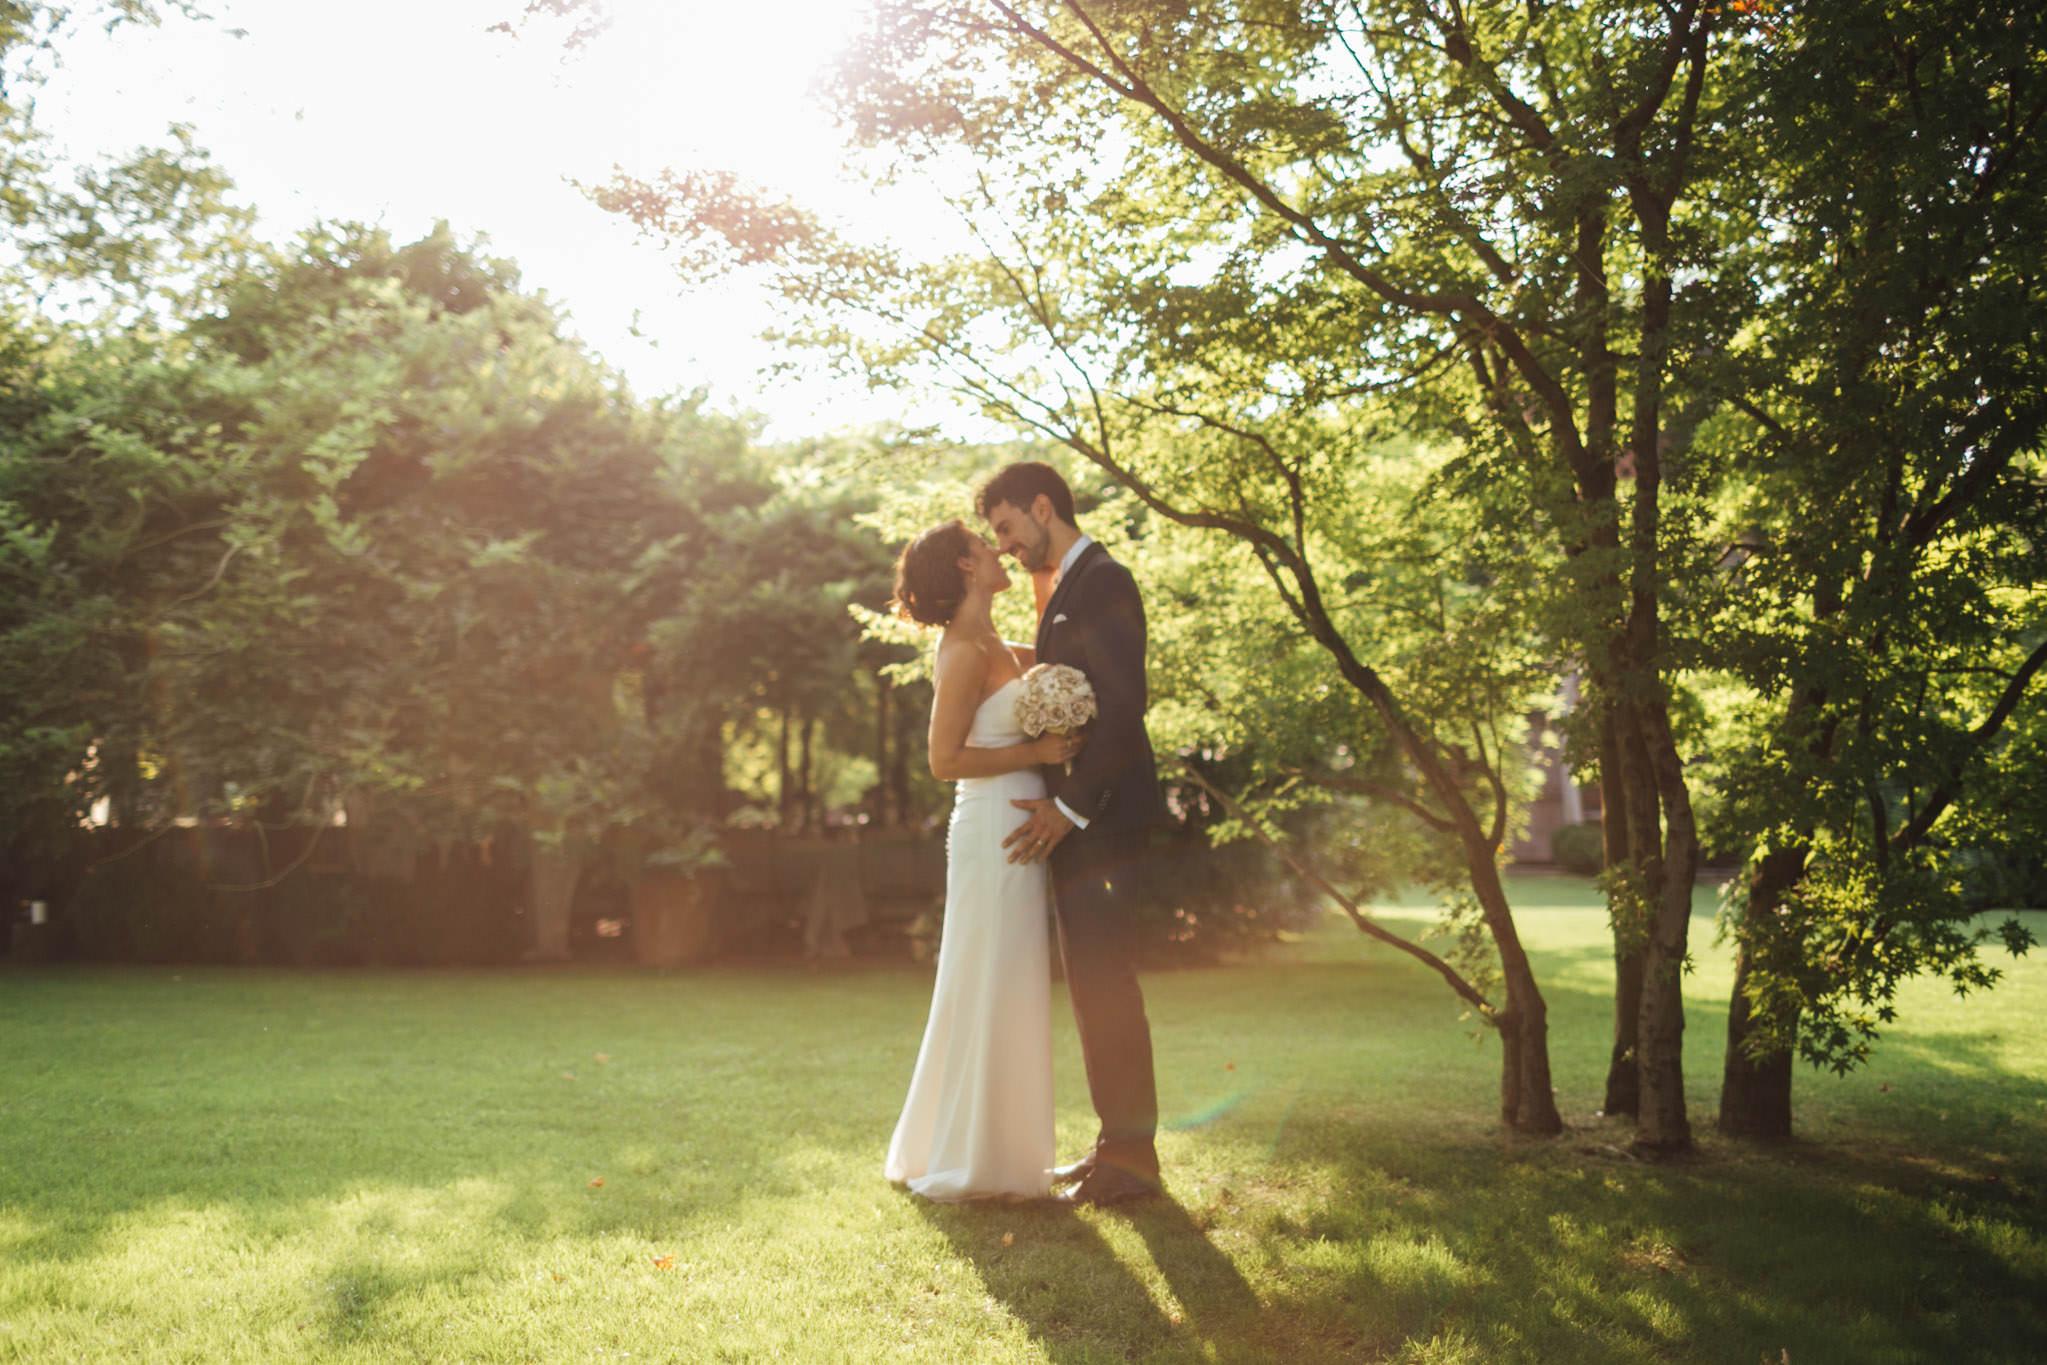 fotografia_di_matrimonio_portfolio-1123